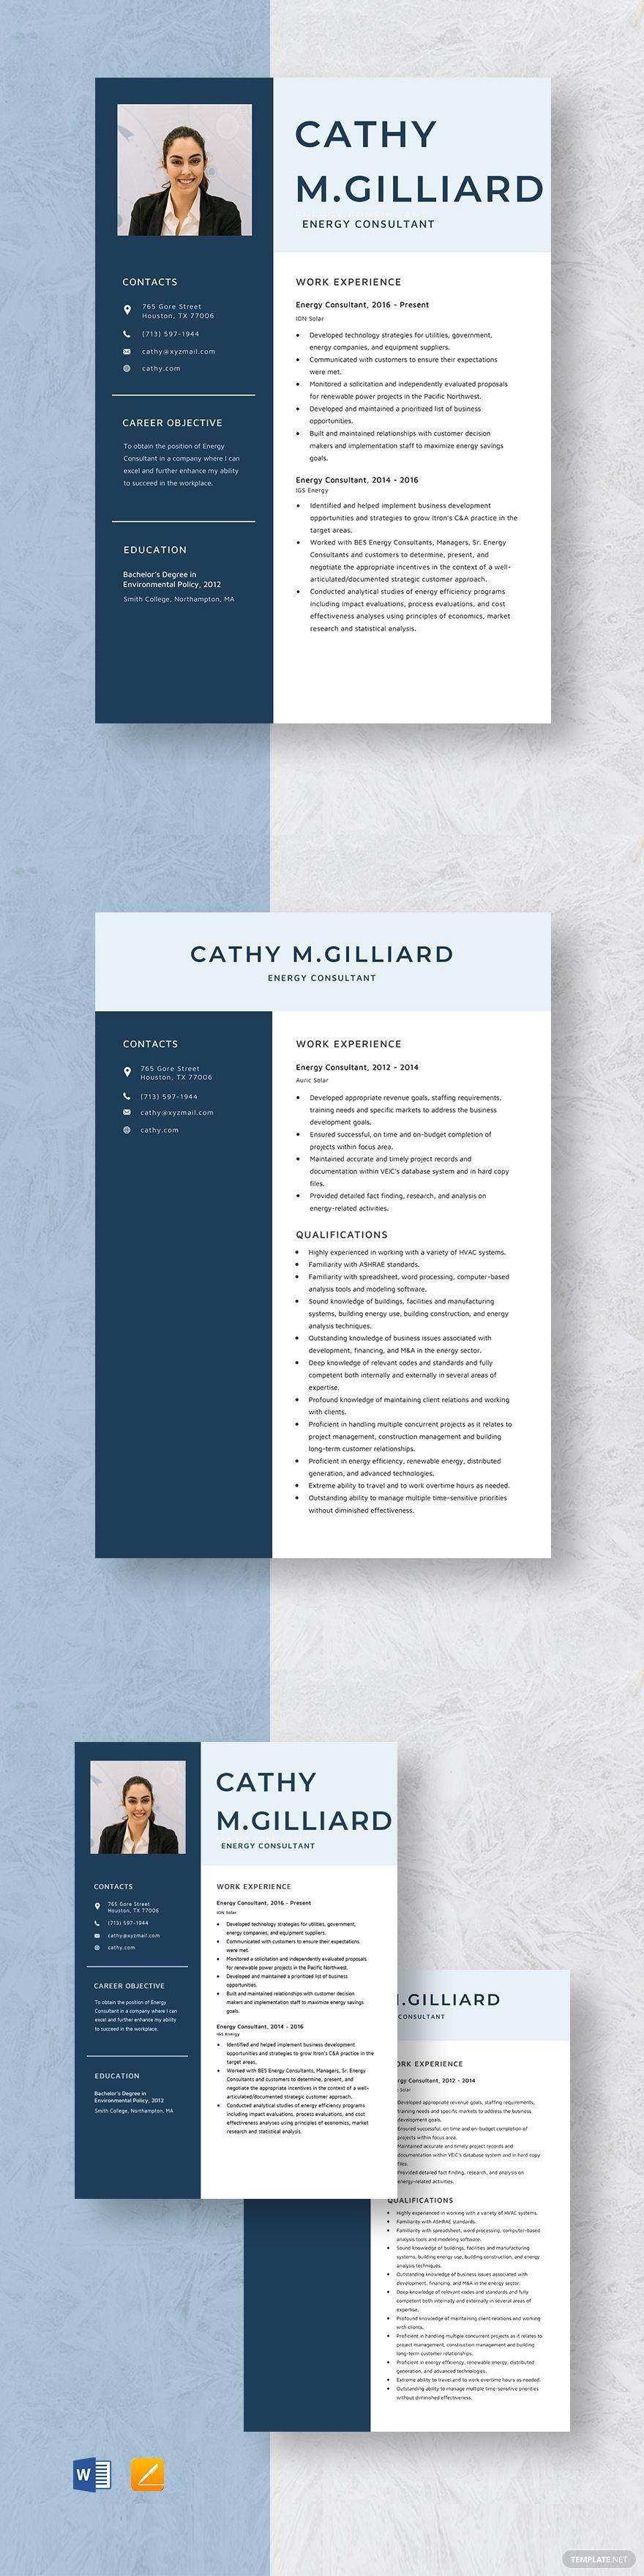 Energy consultant resume template in 2020 educator